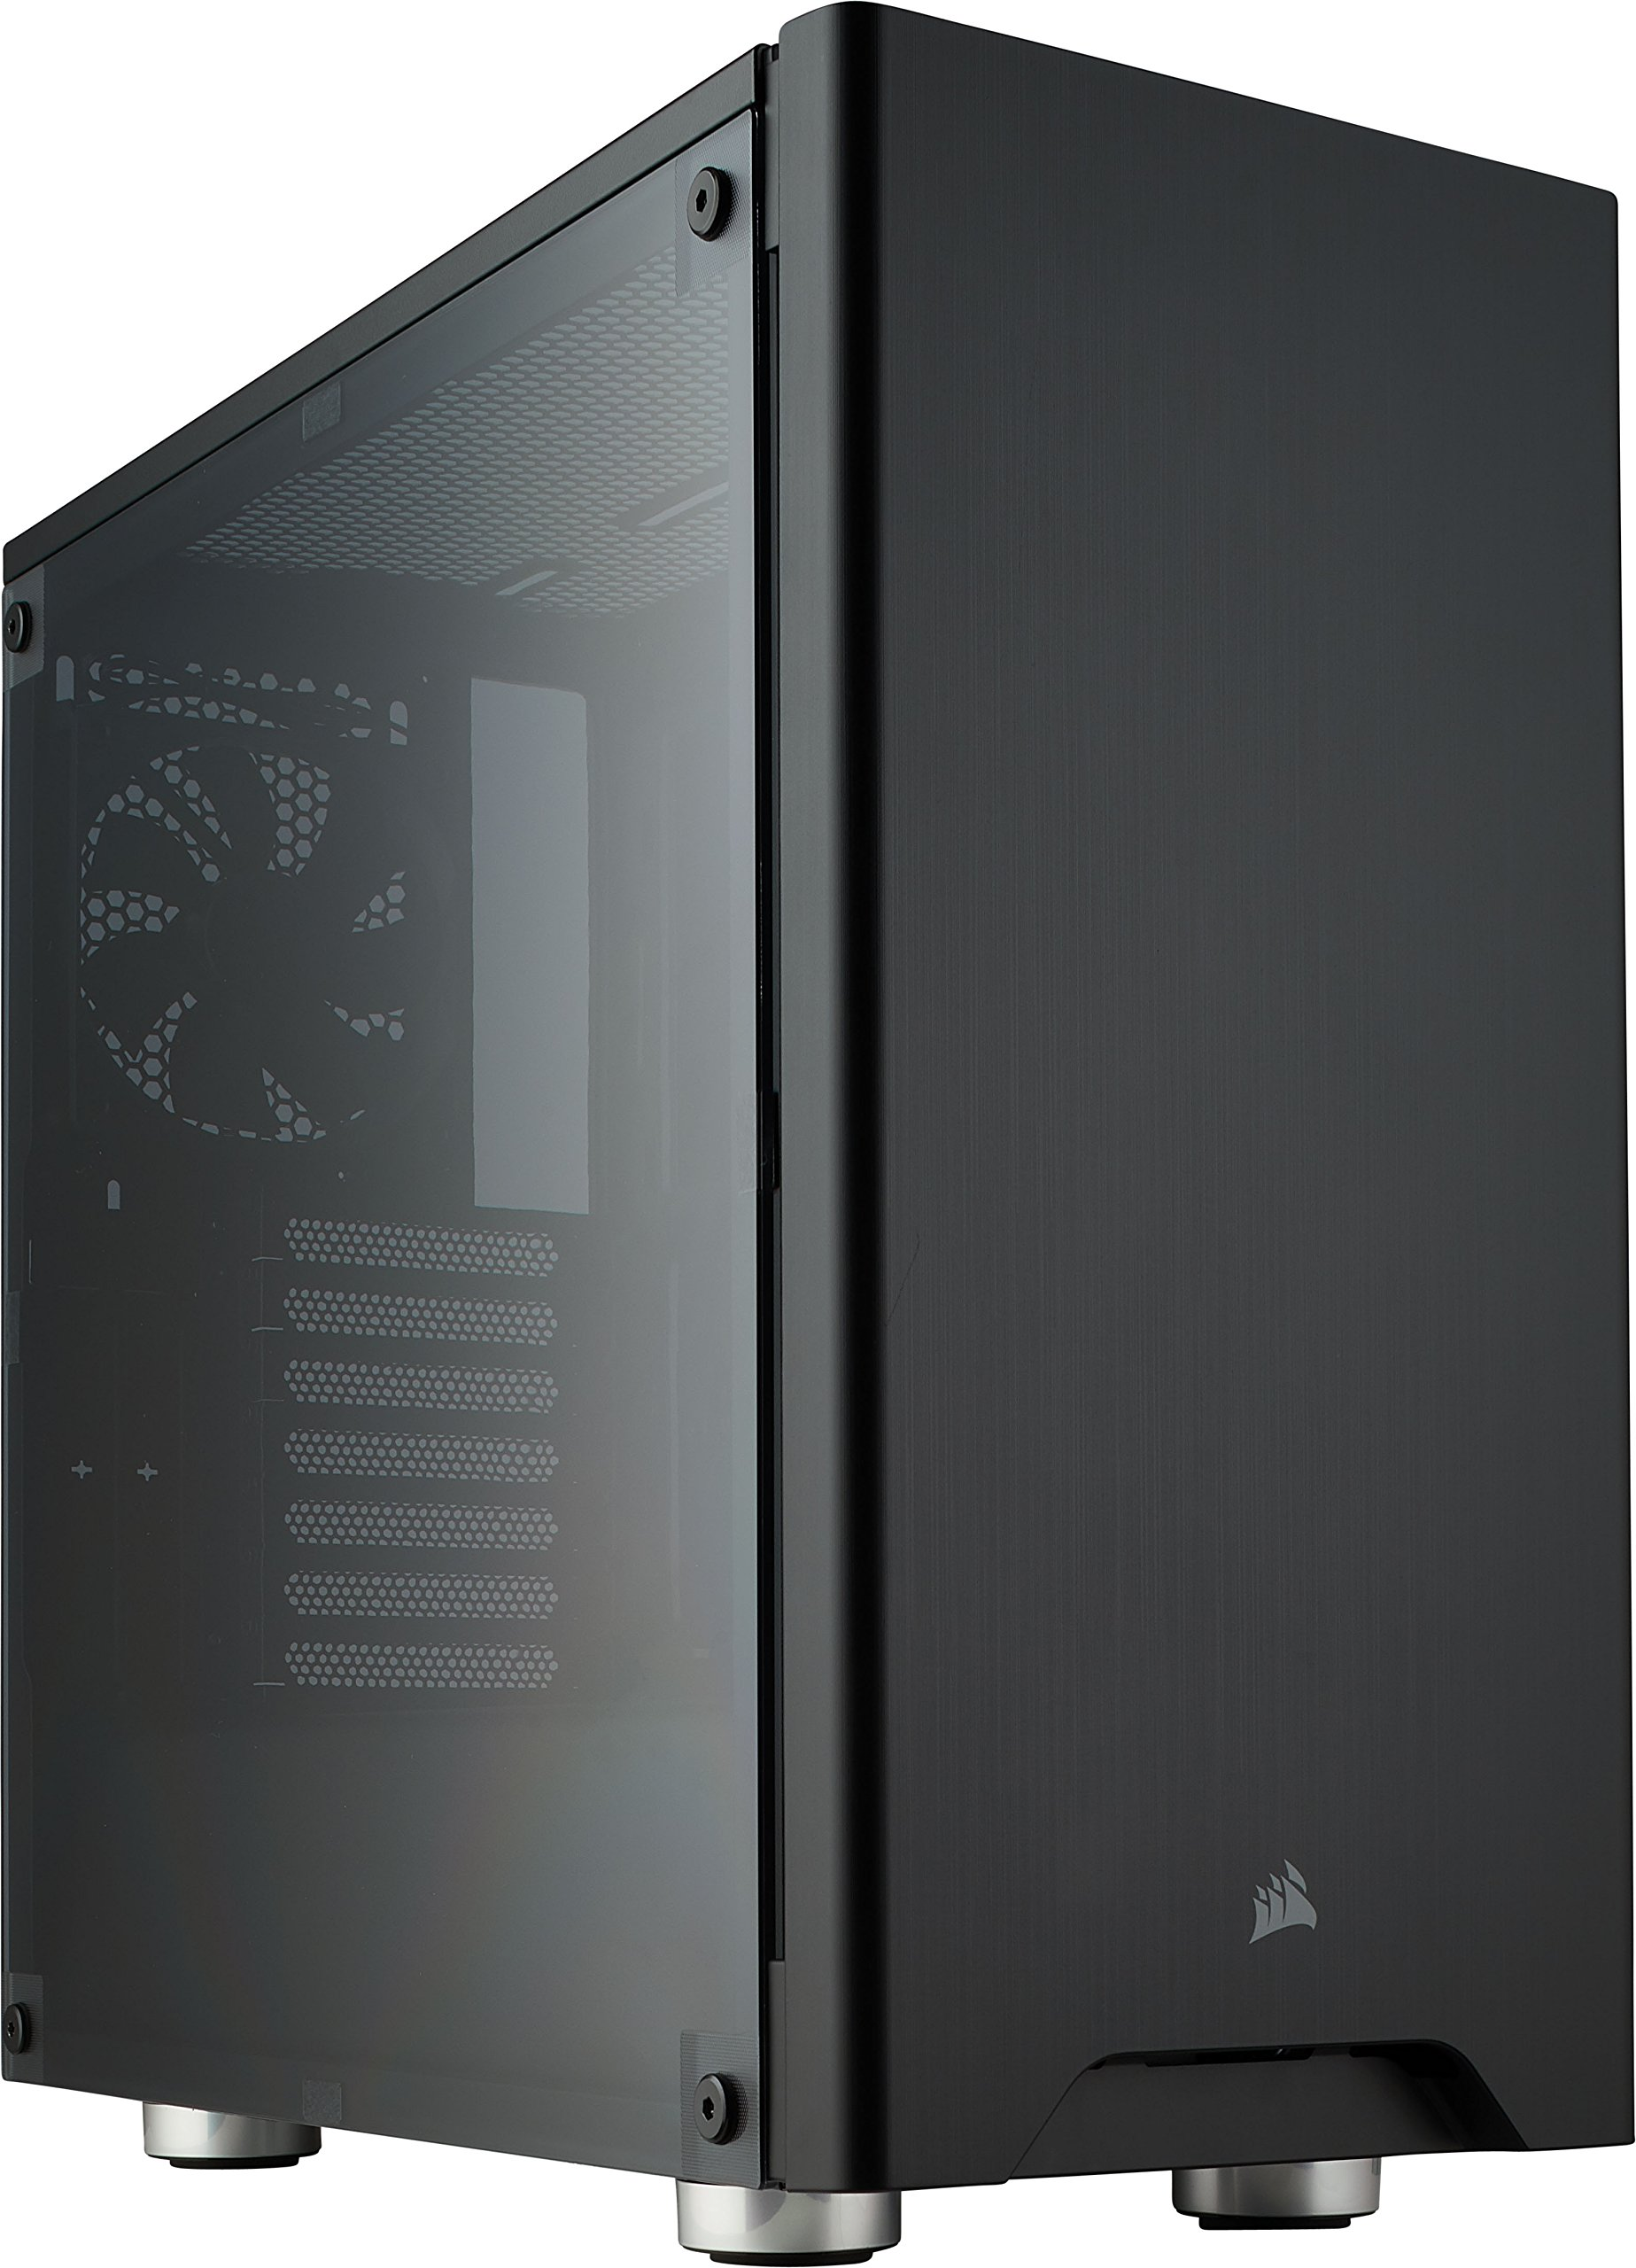 CORSAIR Carbide 275R Mid-Tower Gaming Case, Window Side Panel- Black